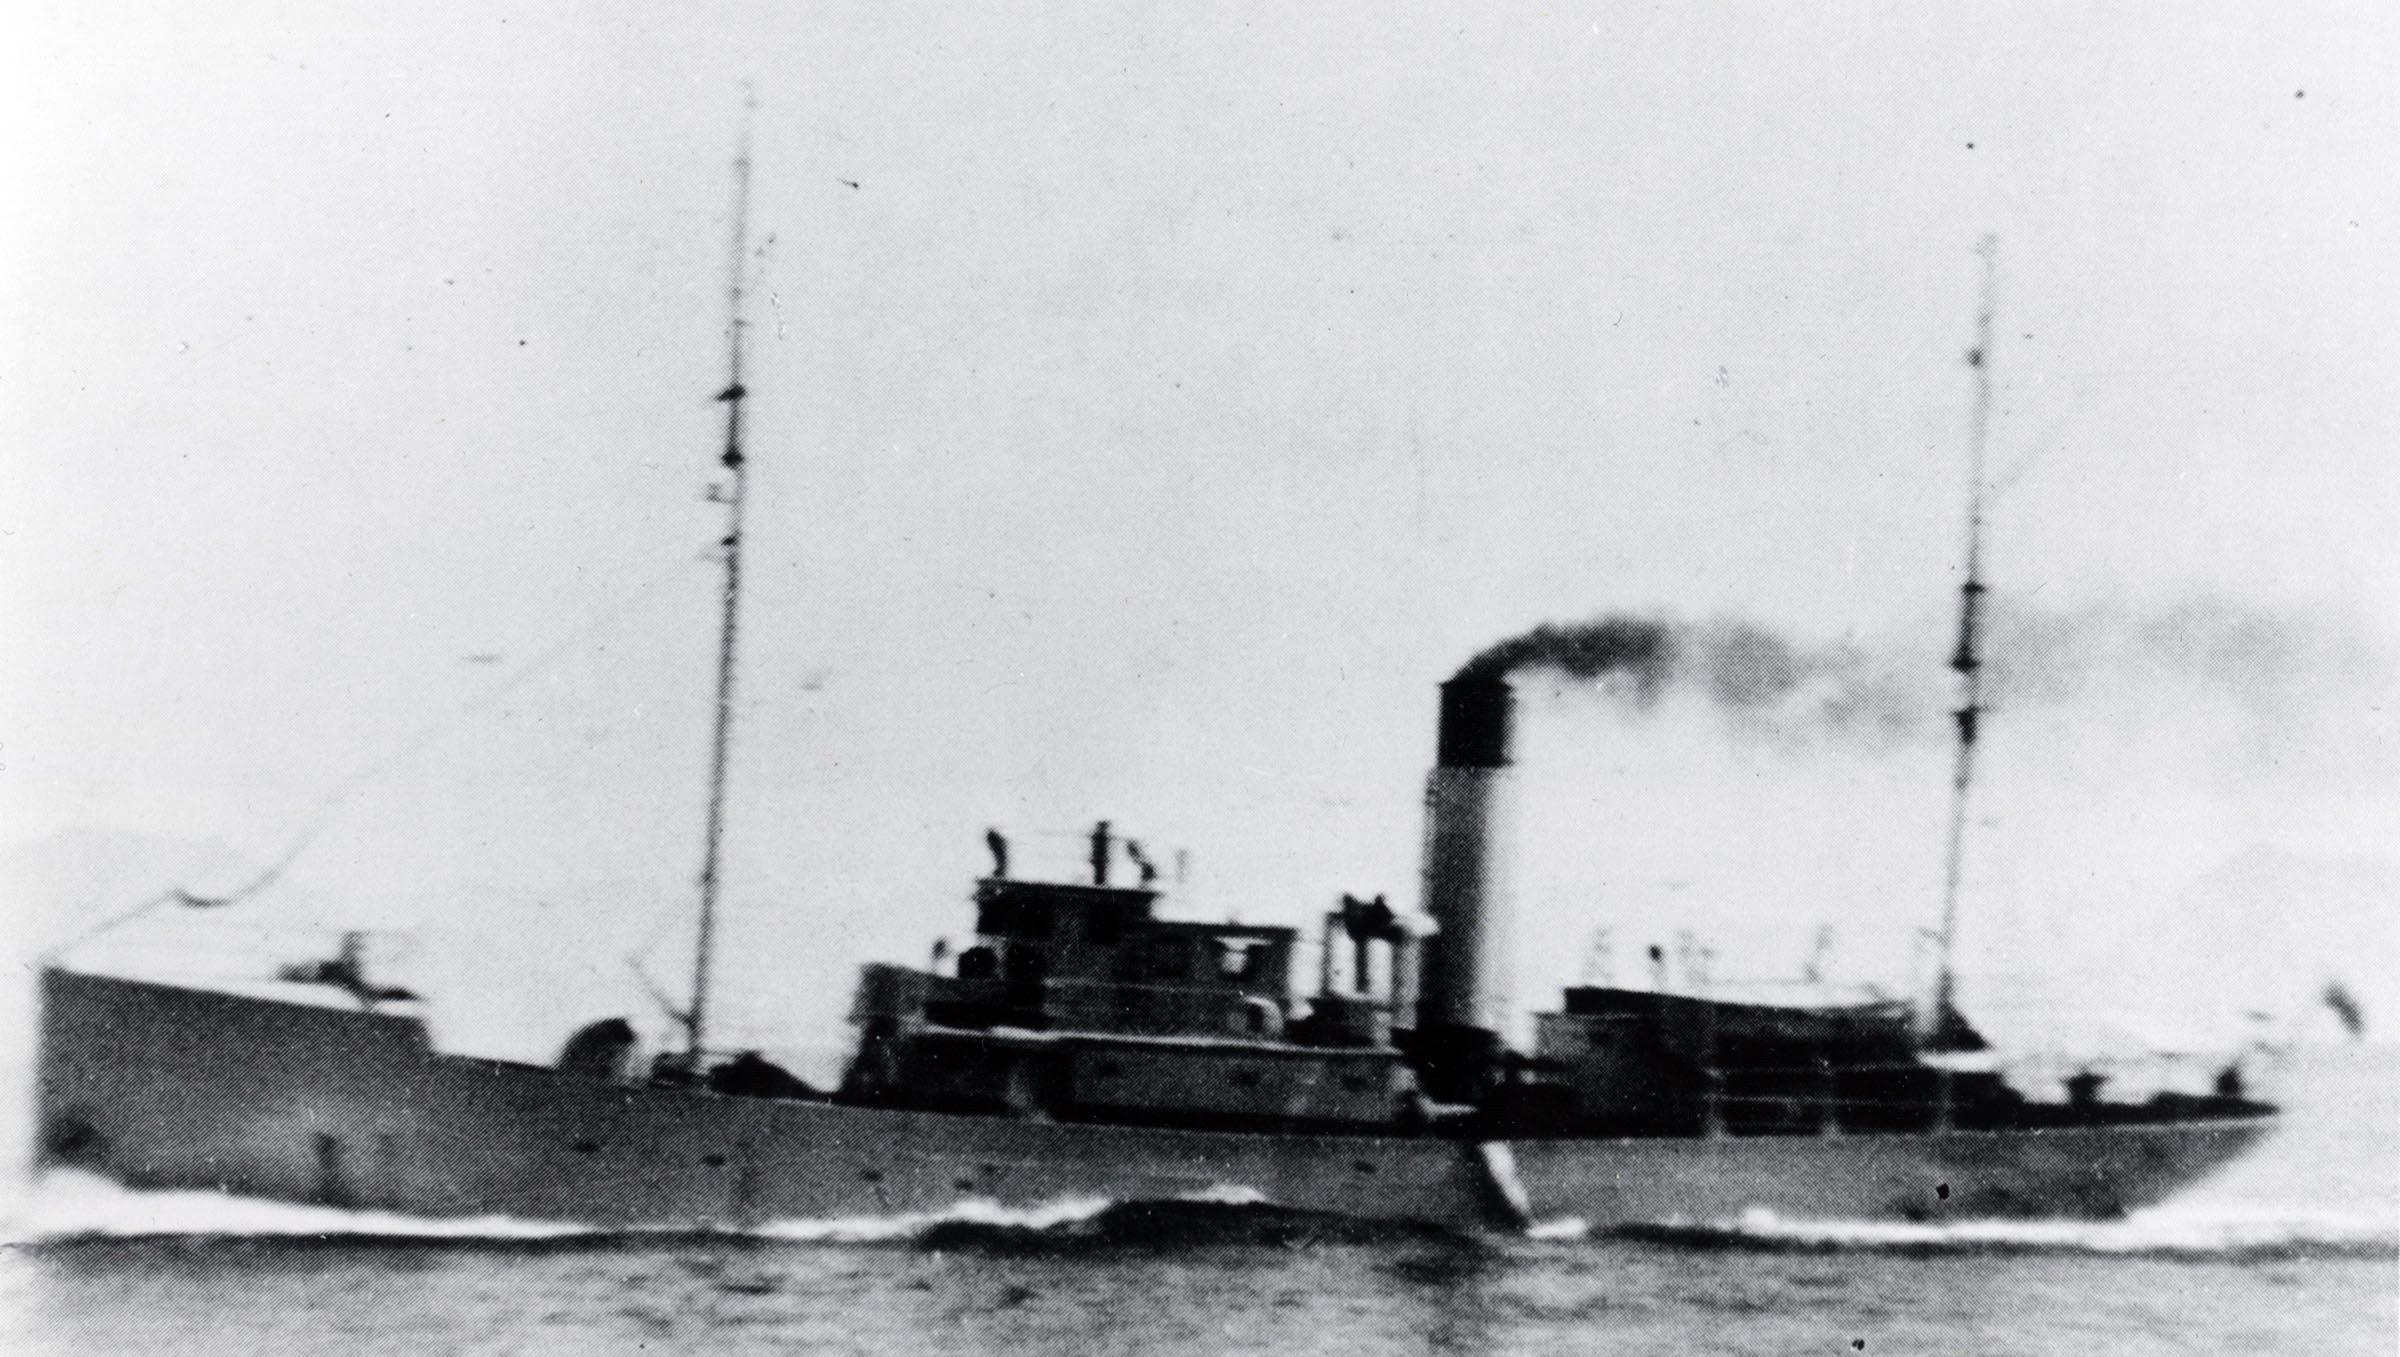 HMCS GIVENCHY